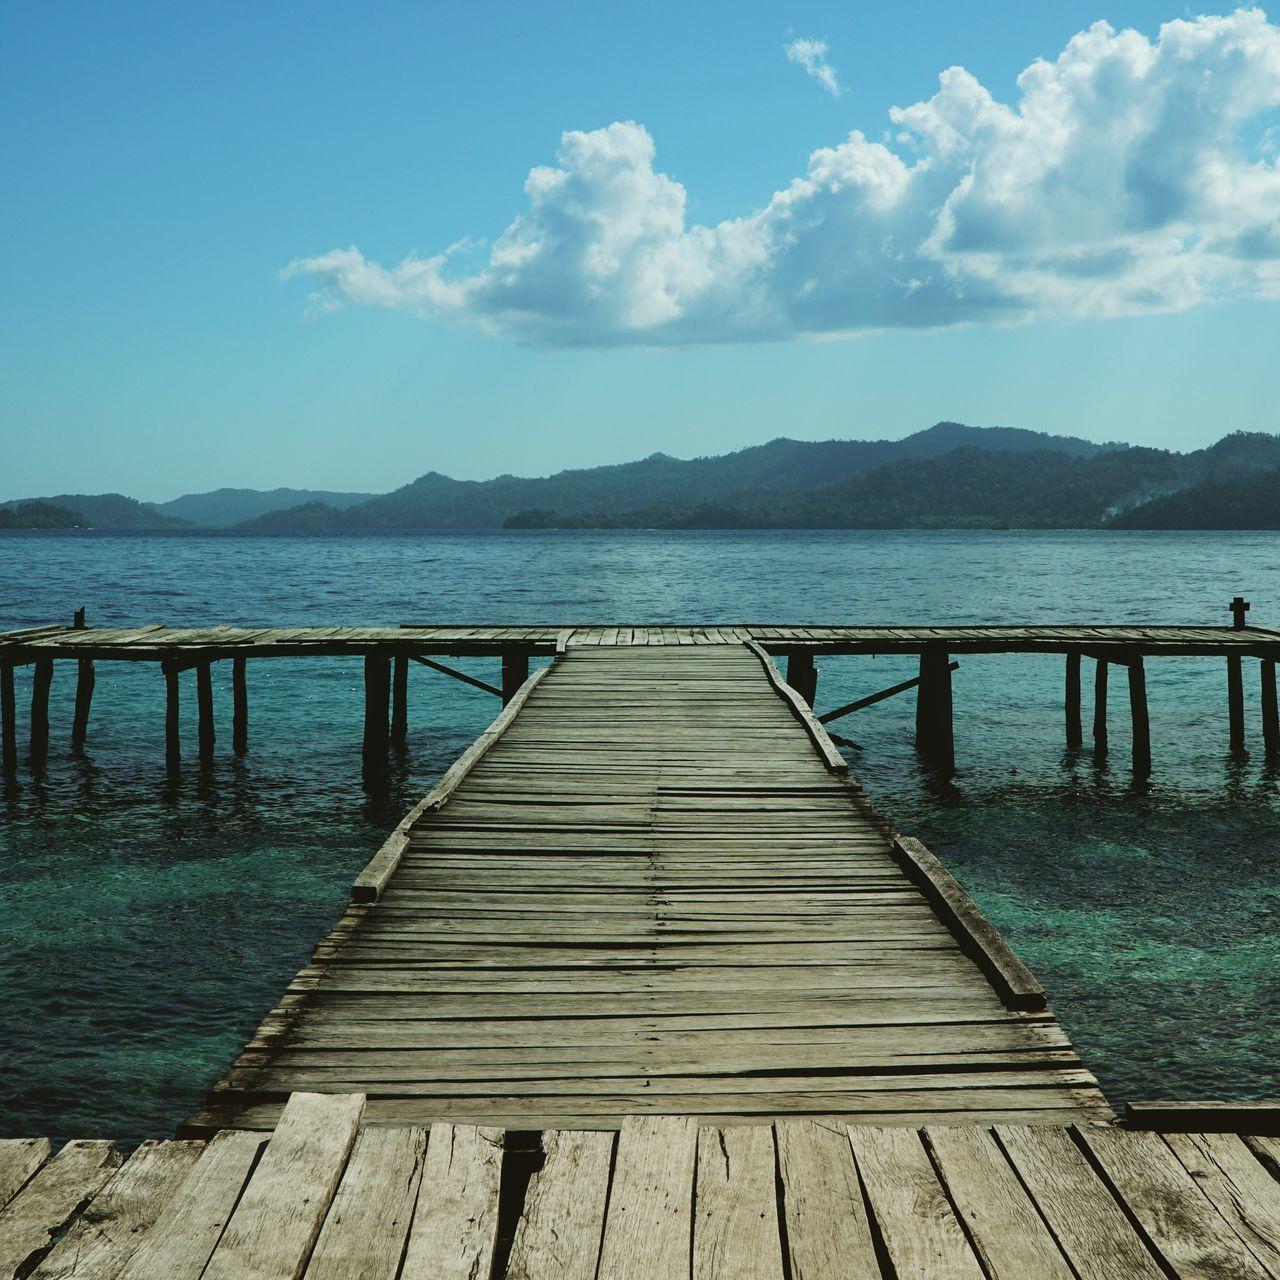 Bridge to paradise Hello World Landscape Sea Papou Blue Sky Blue Sea Deck Rajaampat Waigeo Island